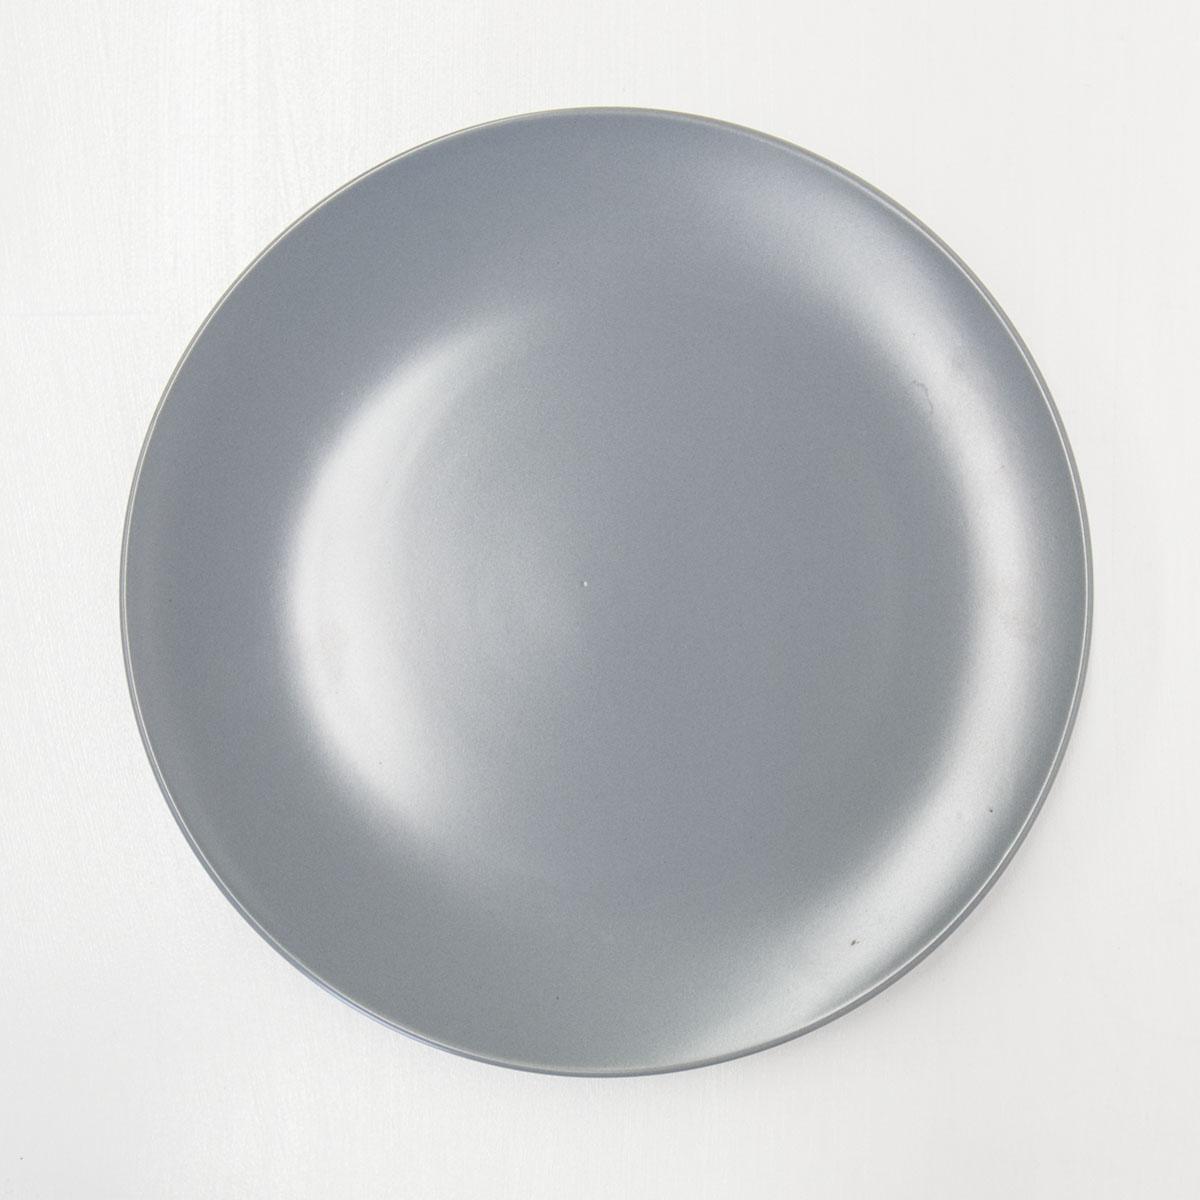 GREY DINNER PLATE